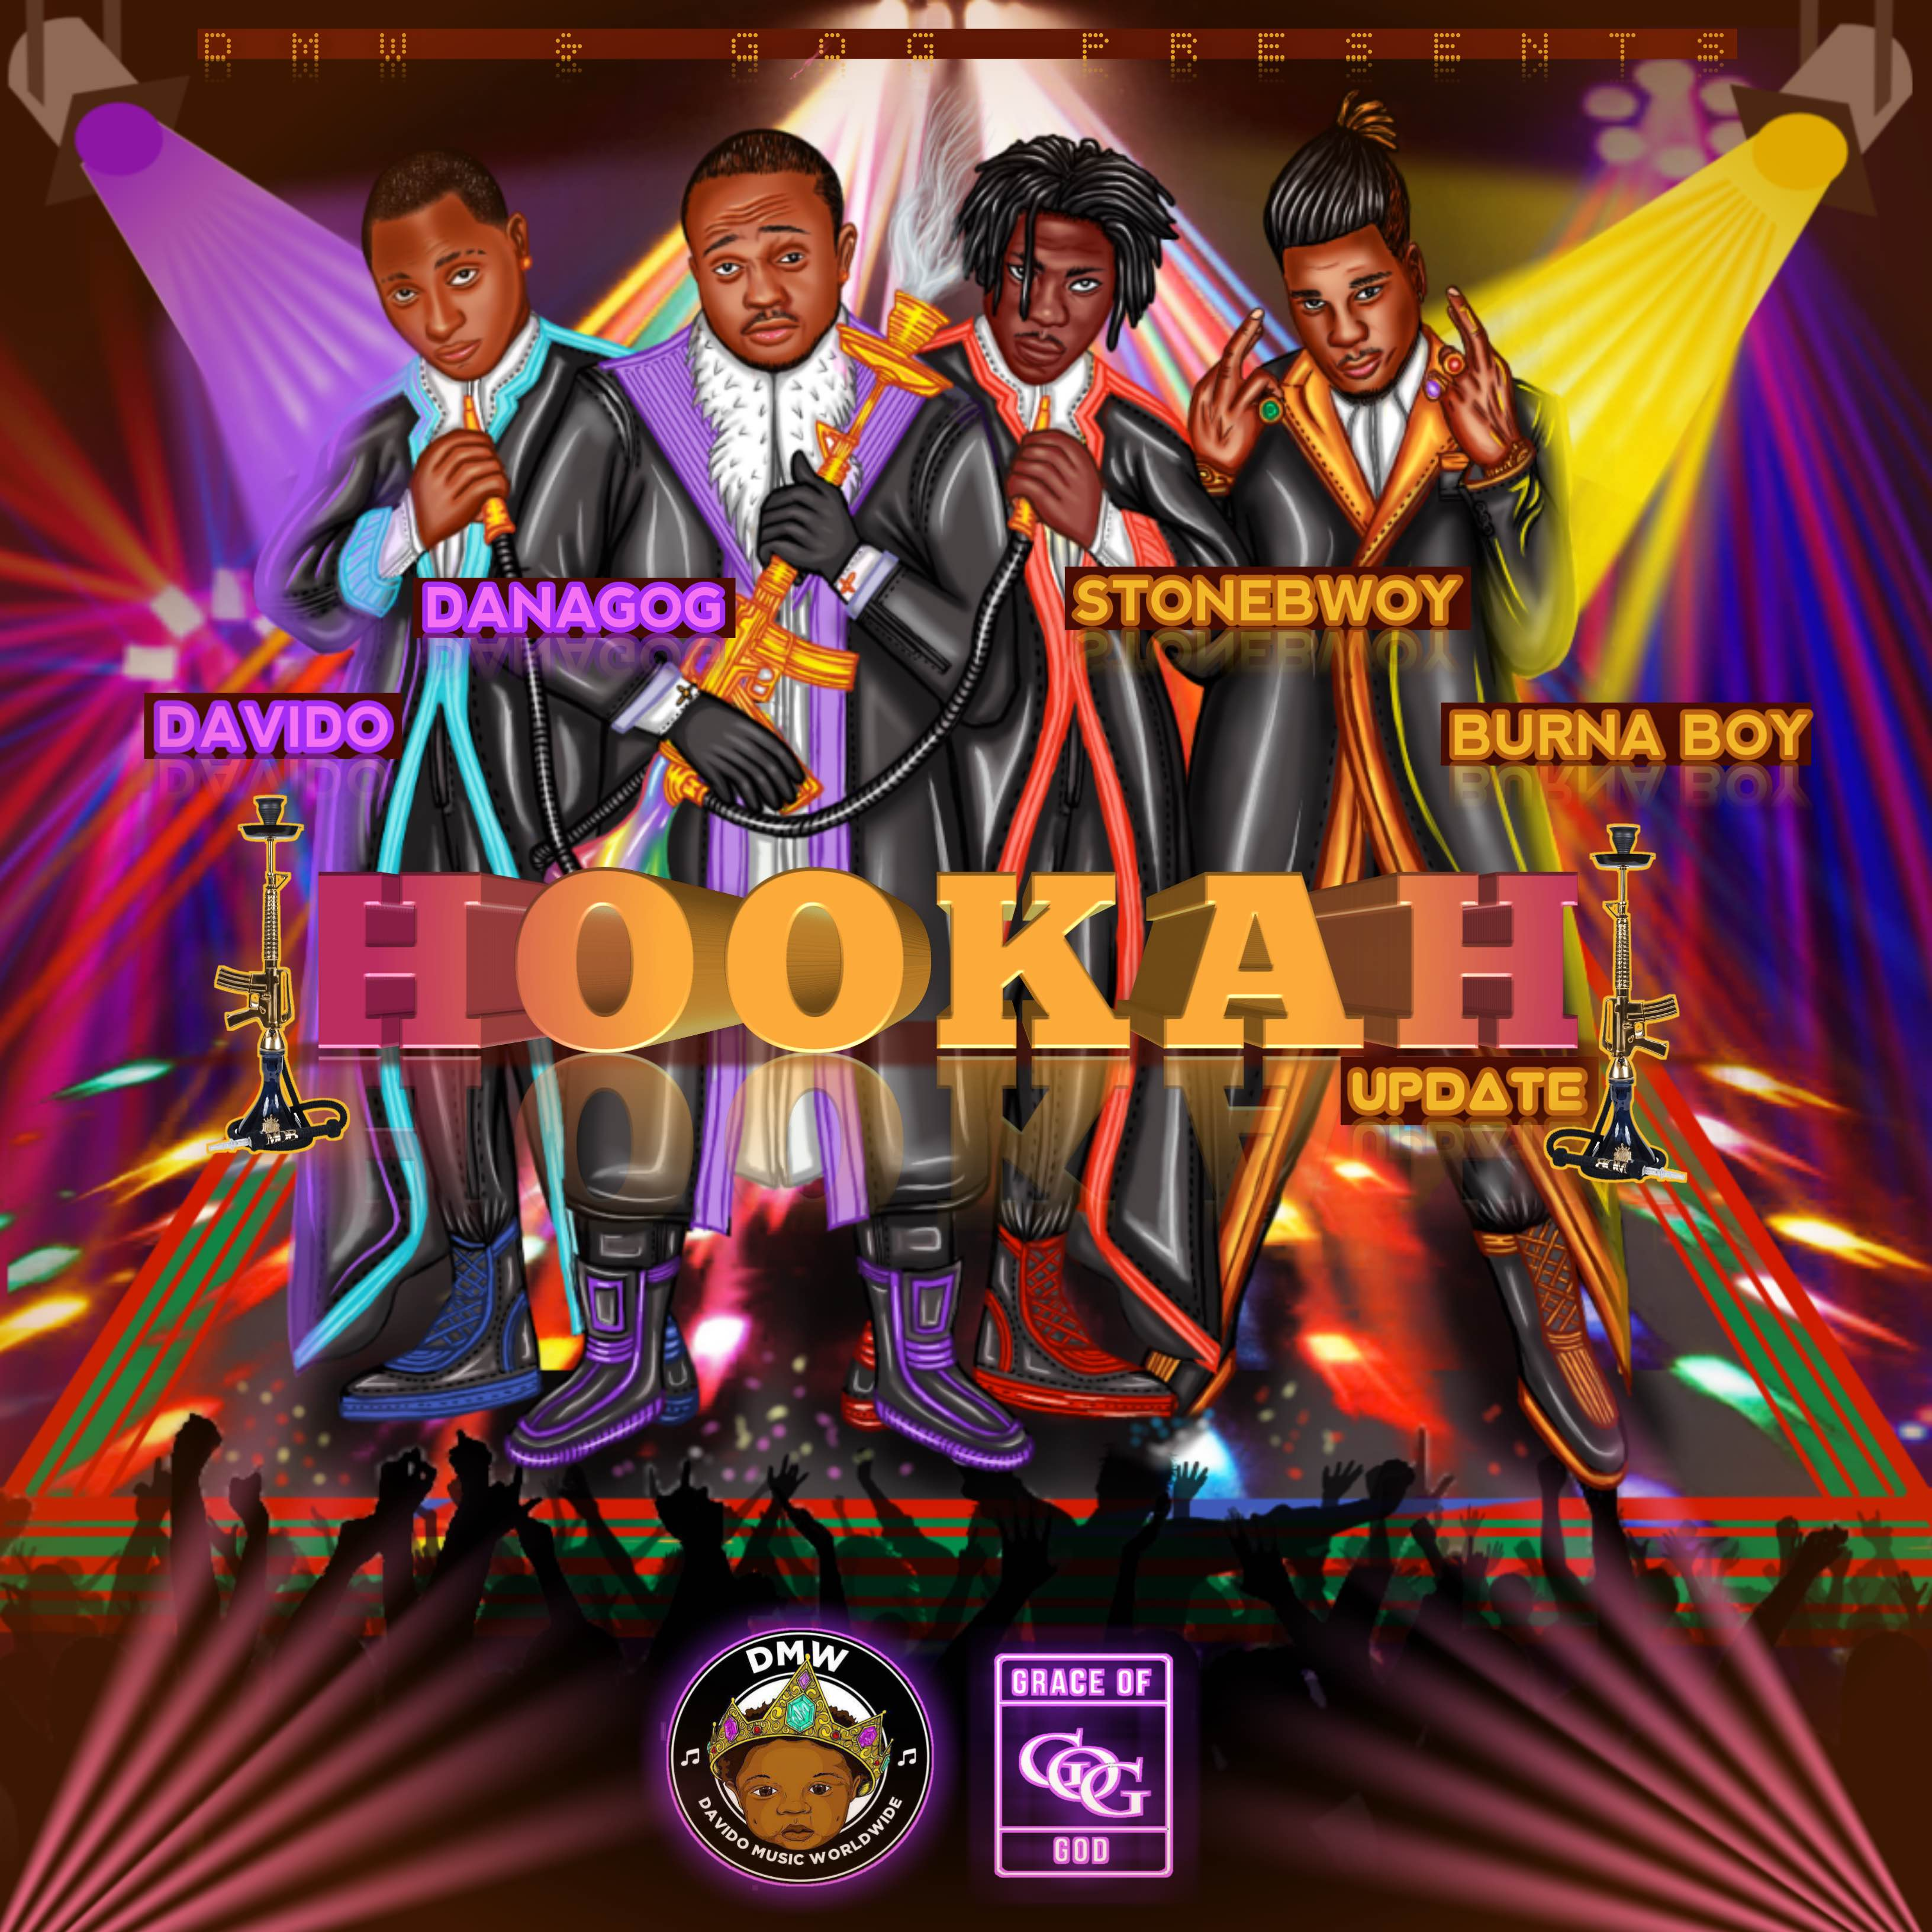 Danagog ft. Davido X Stonebwoy X Burna Boy - Hookah (Remix)